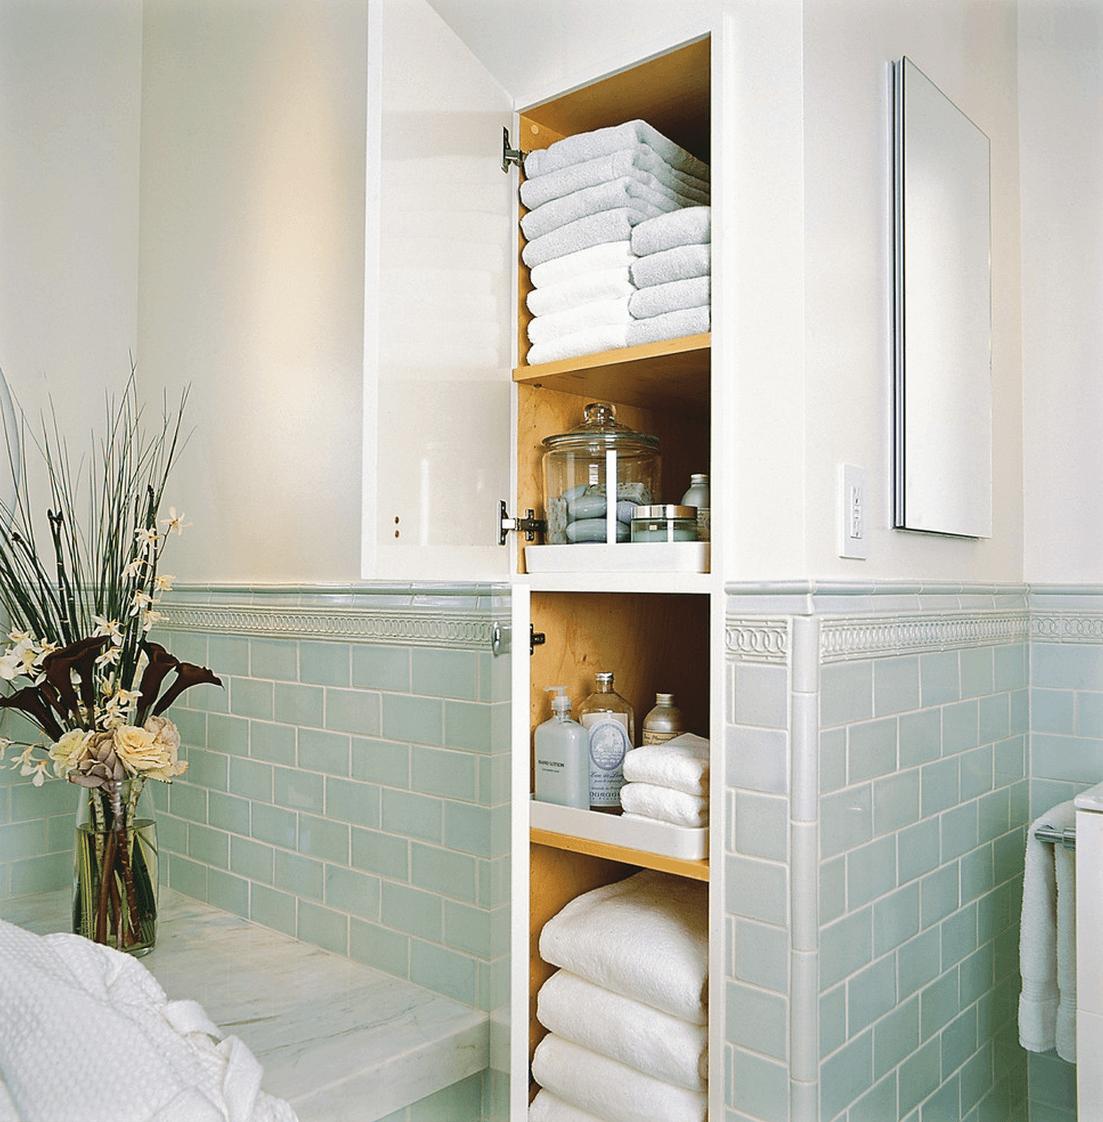 44 Unique Storage Ideas For A Small Bathroom To Make Yours Bigger Best Small Bathroom Organization Design Ideas